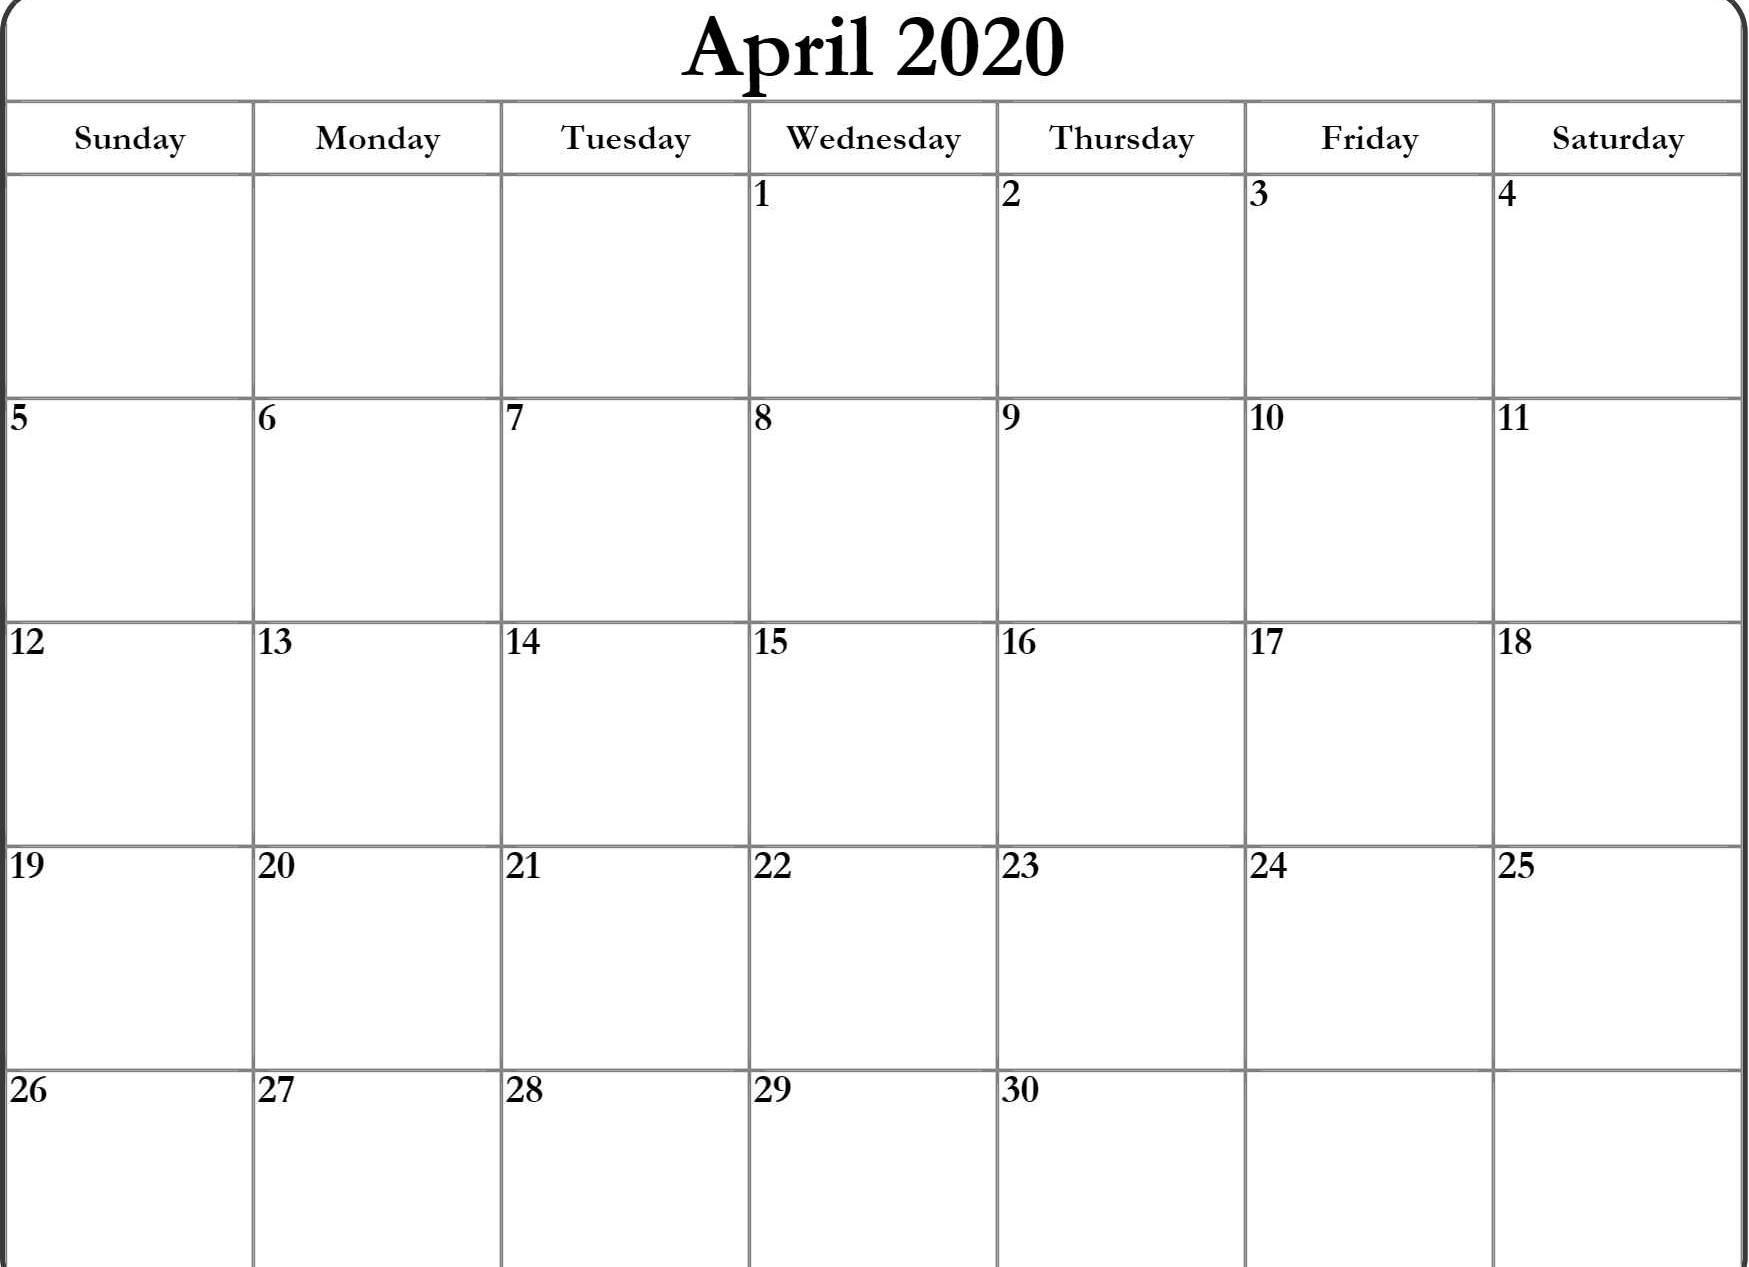 April Calendar 2020 | Free Printable Calendar Templates